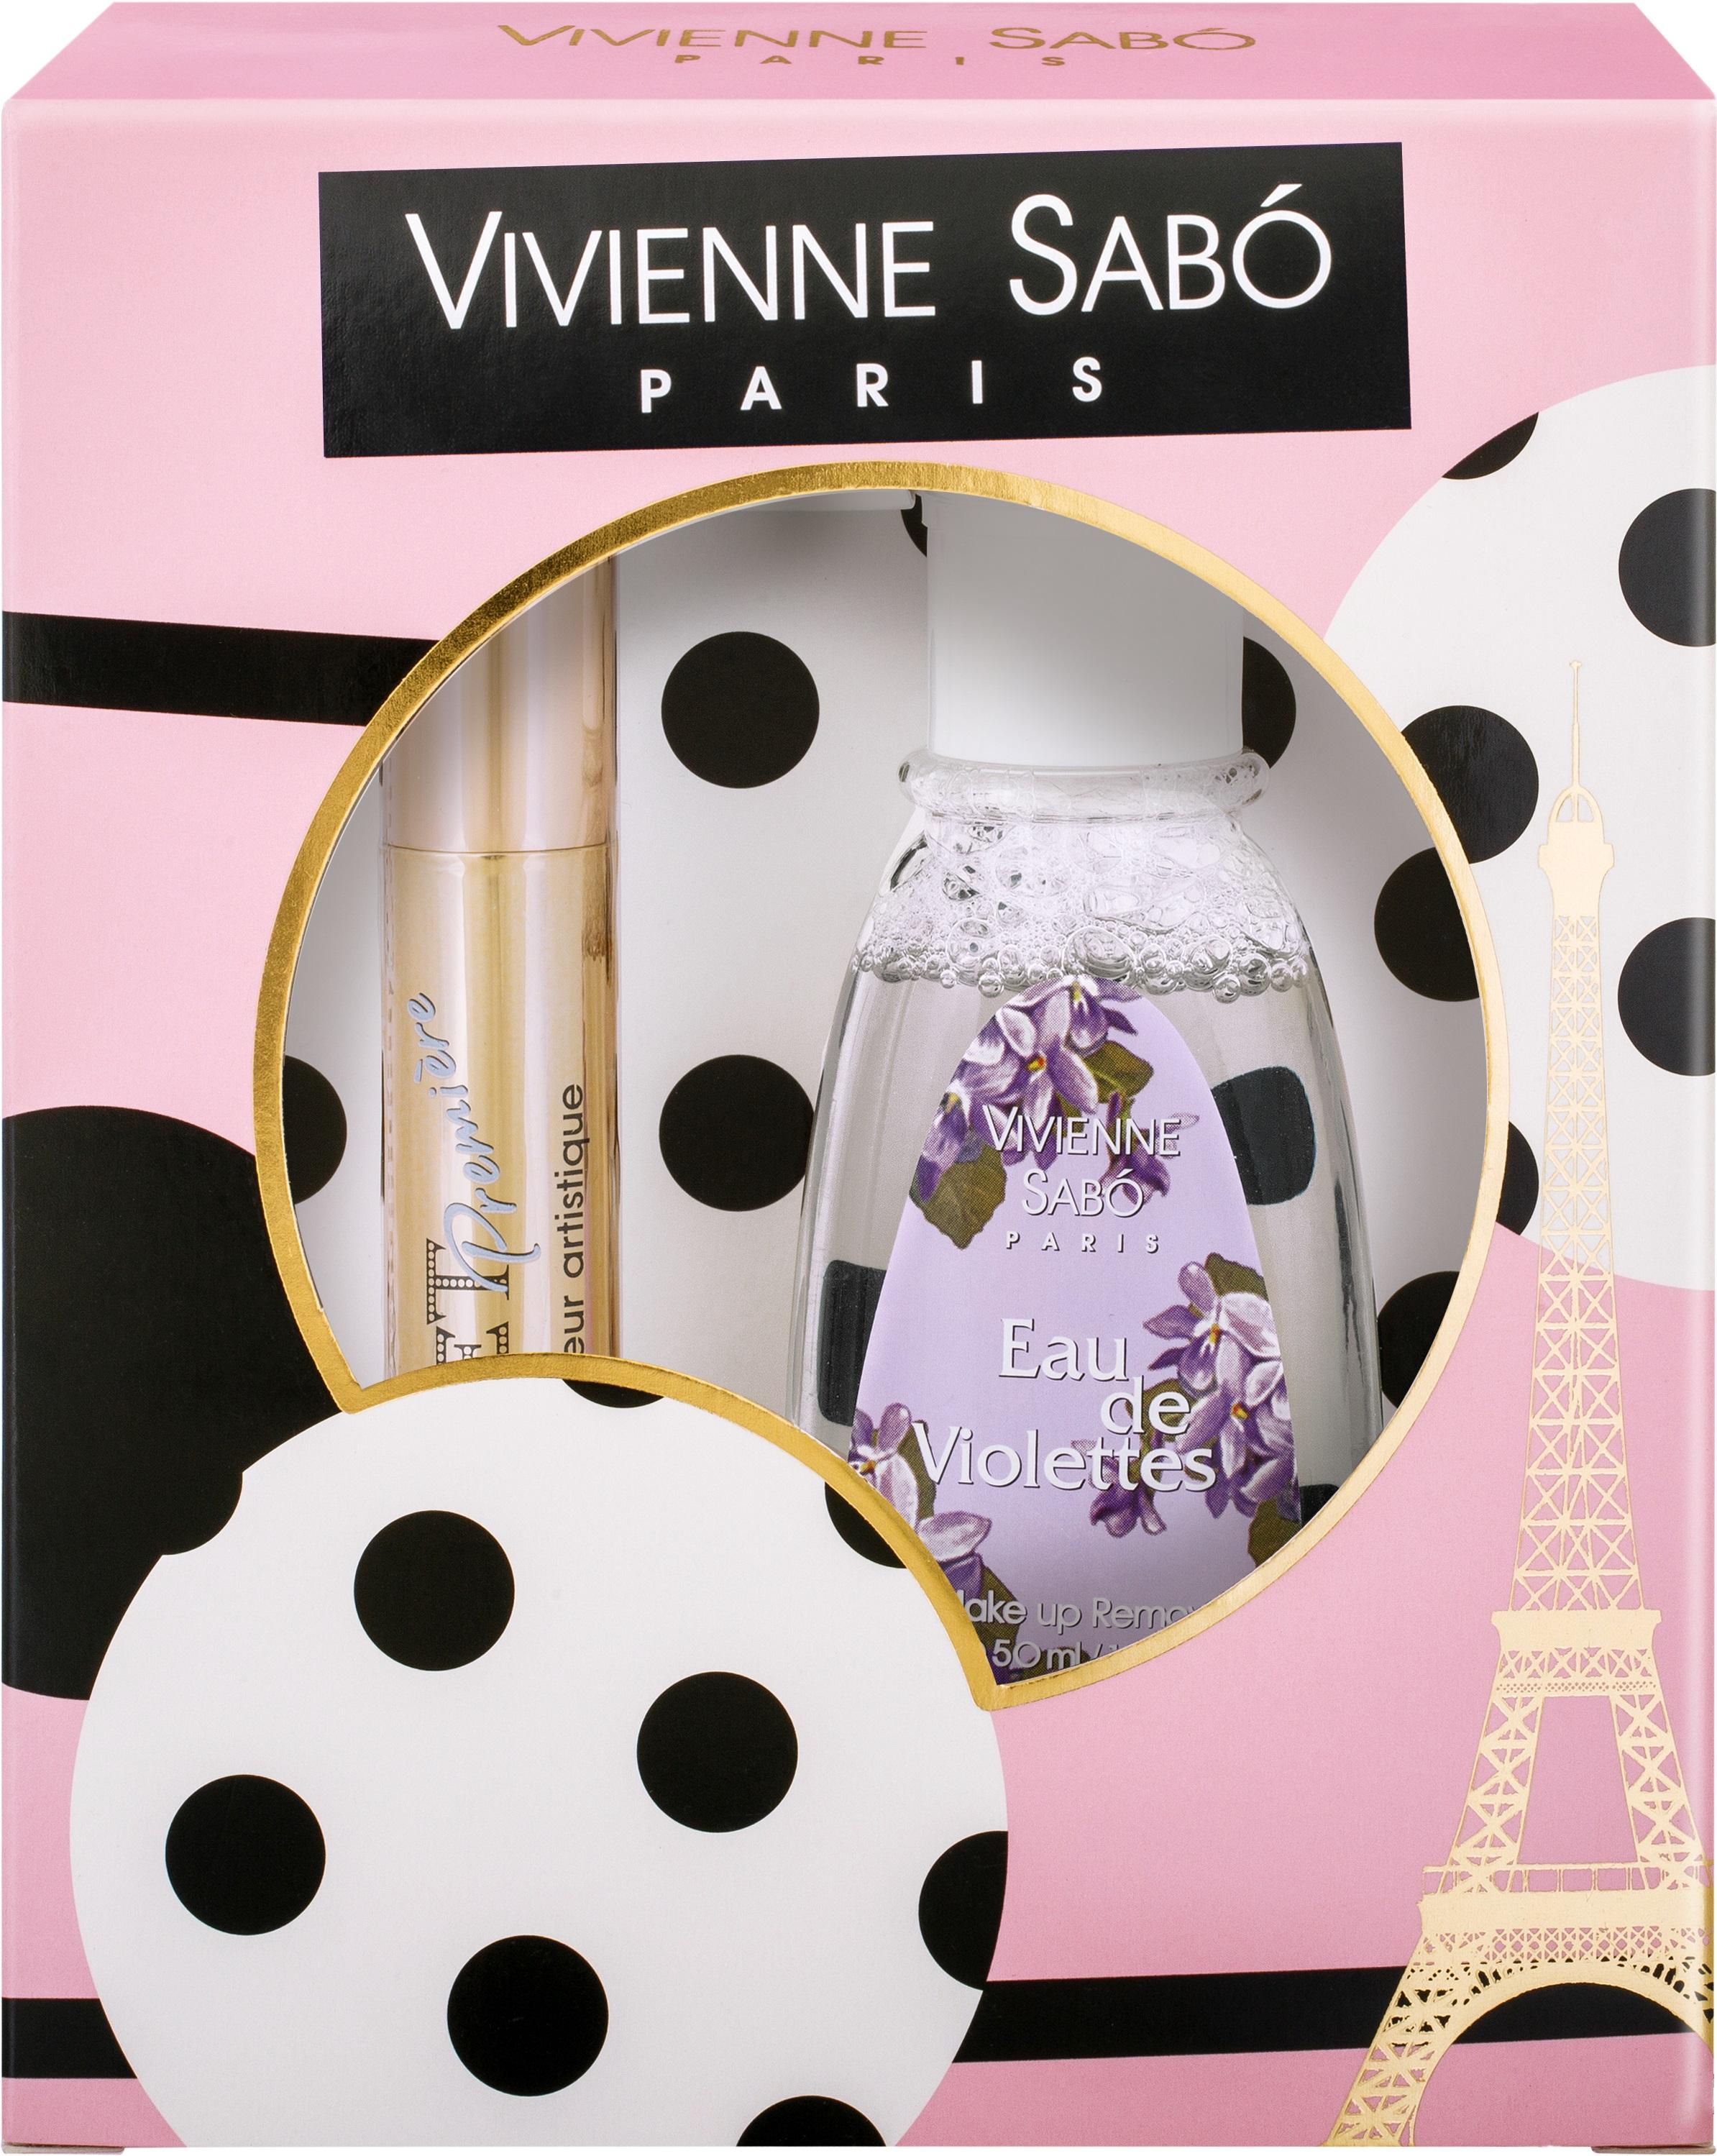 Vivienne Sabo Подарочный набор Тушь Cabaret premiere» т. 01 и Жидкость для снятия макияжа vivienne sabo vi054lwseq91 vivienne sabo